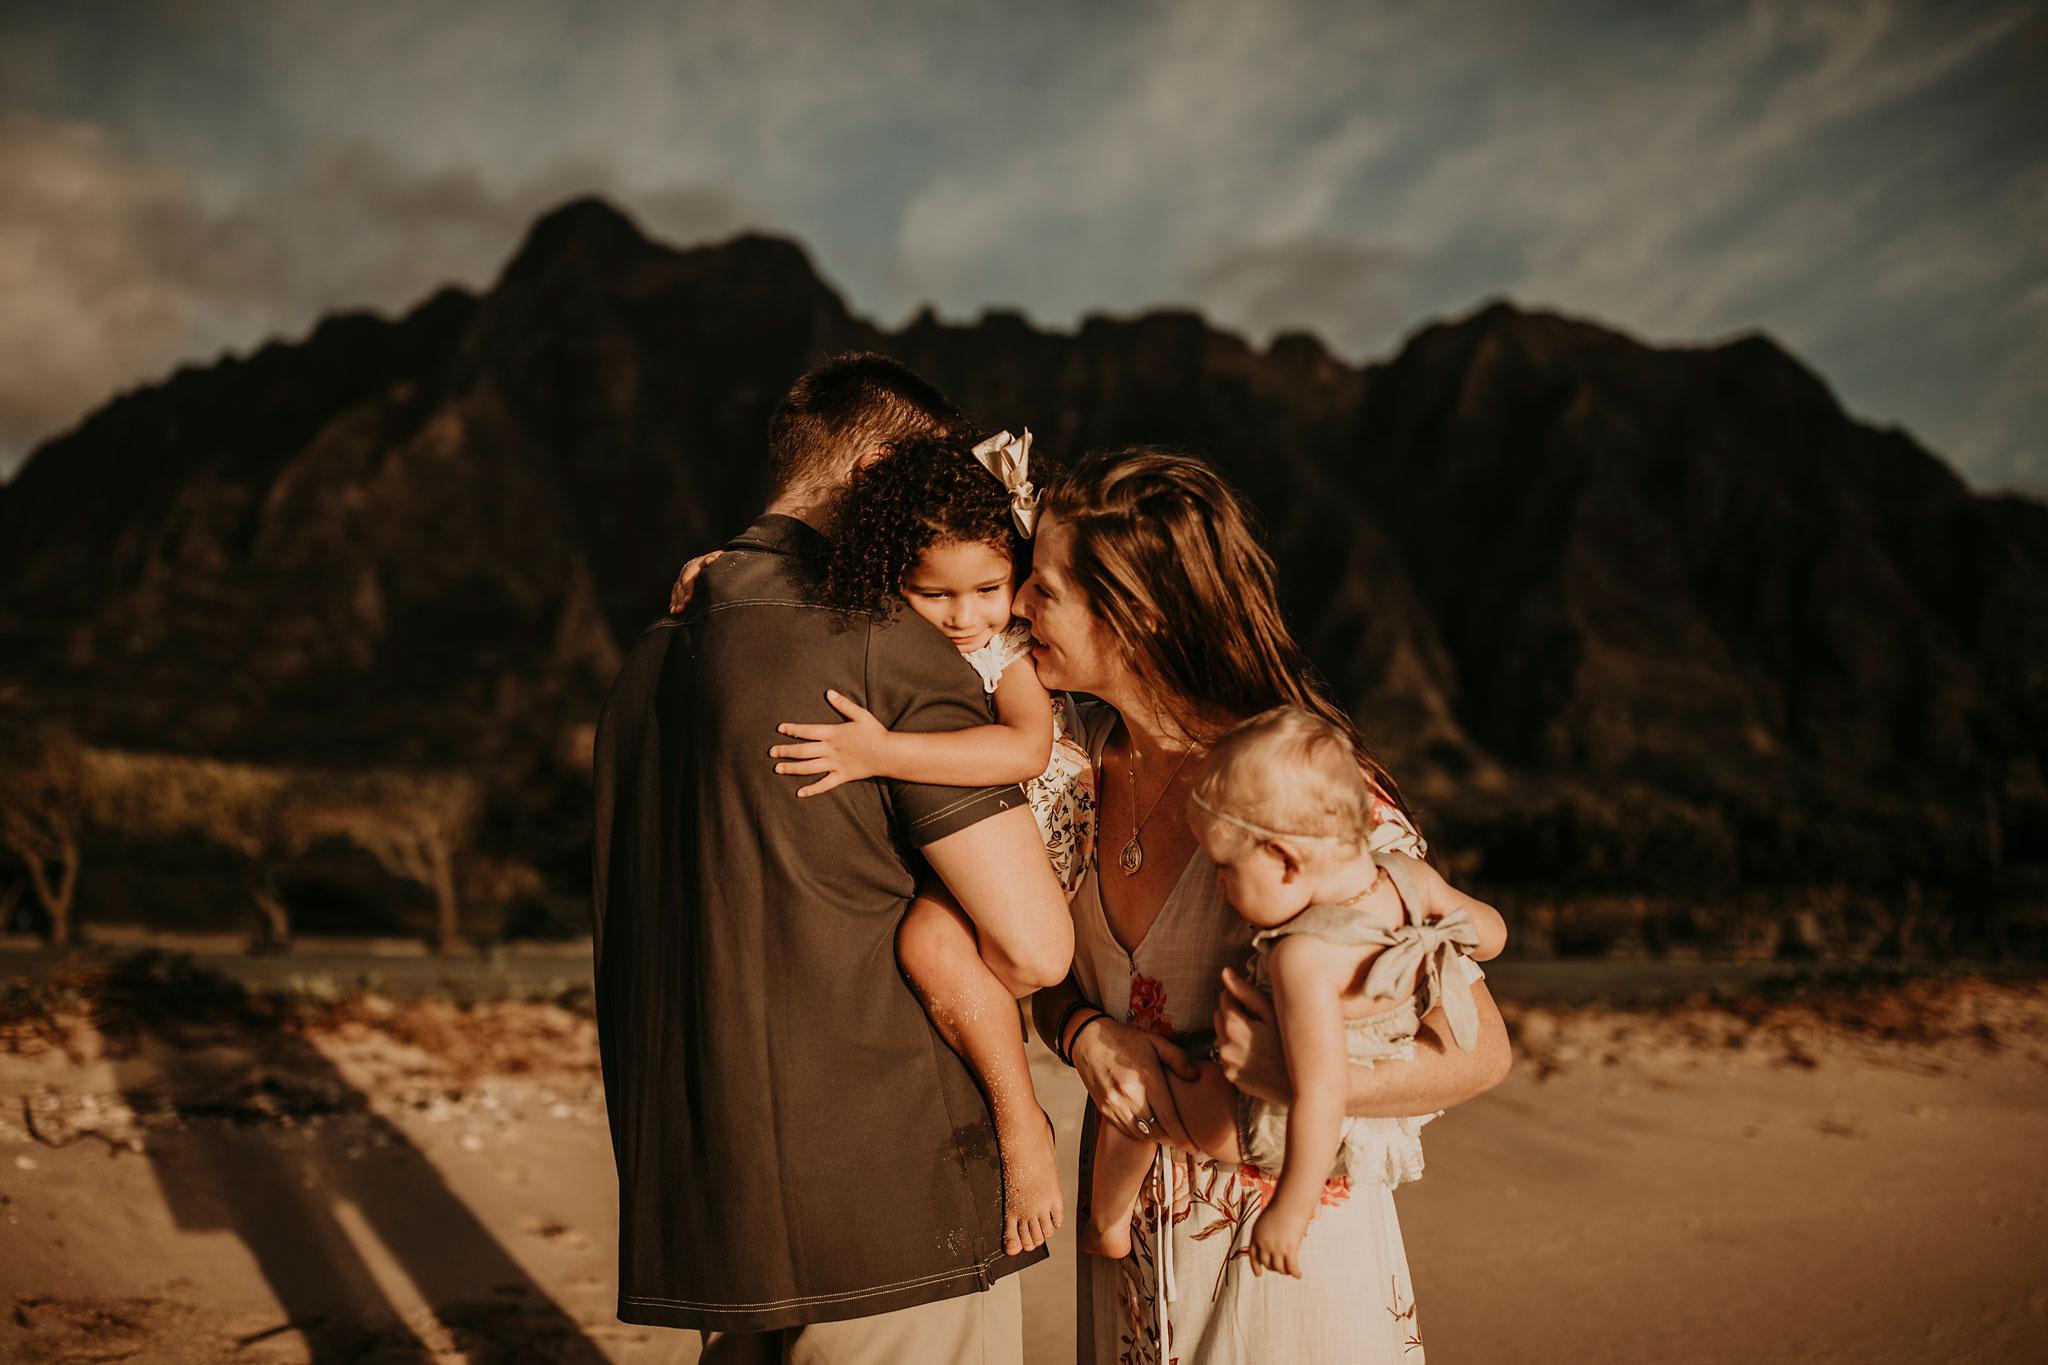 Sunrise-family-shoot-kualoa-ranch-13.jpg